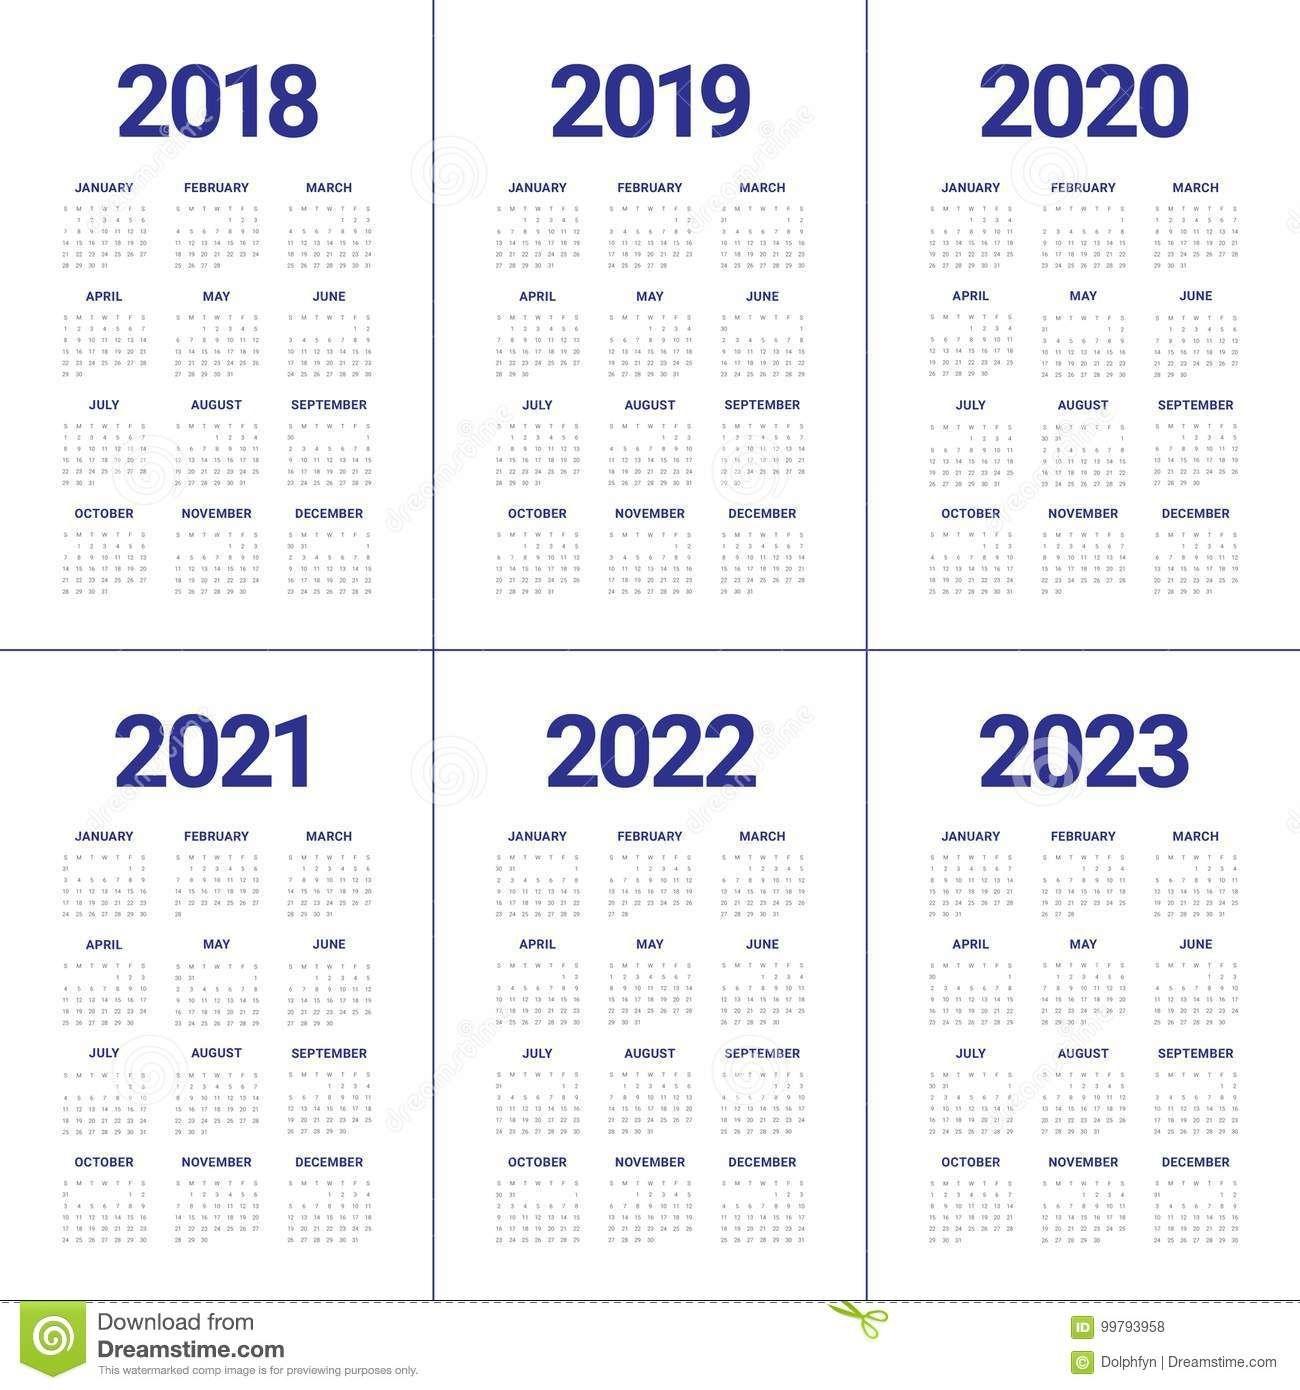 3 Year Calendar 2021 To 2023 | Calendar Printables Free Blank